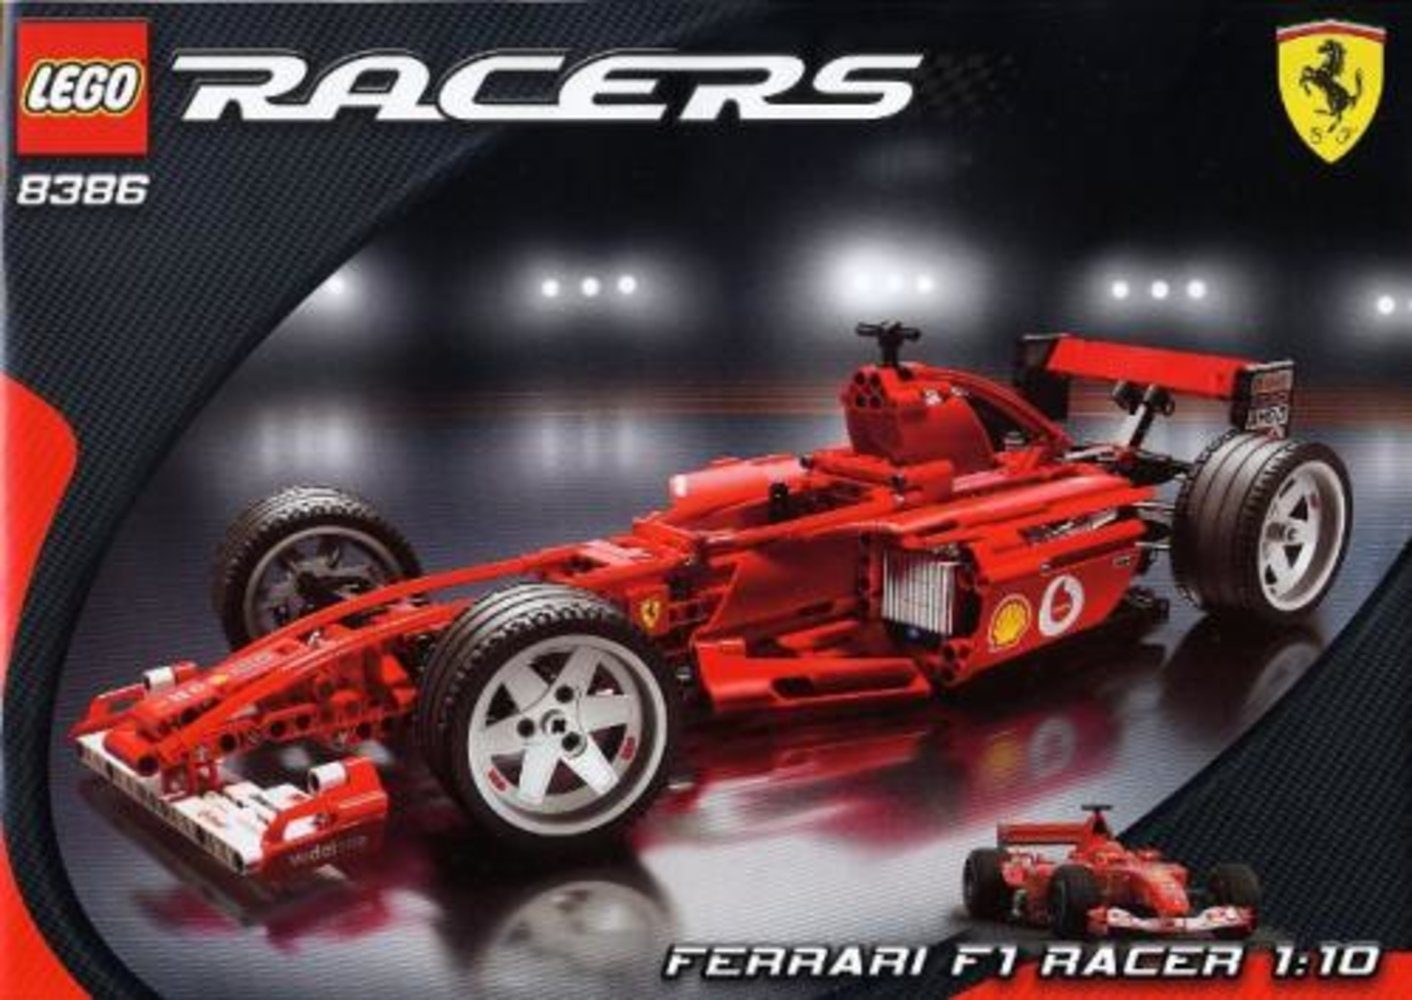 Ferrari F1 Racer 1:10 Scale